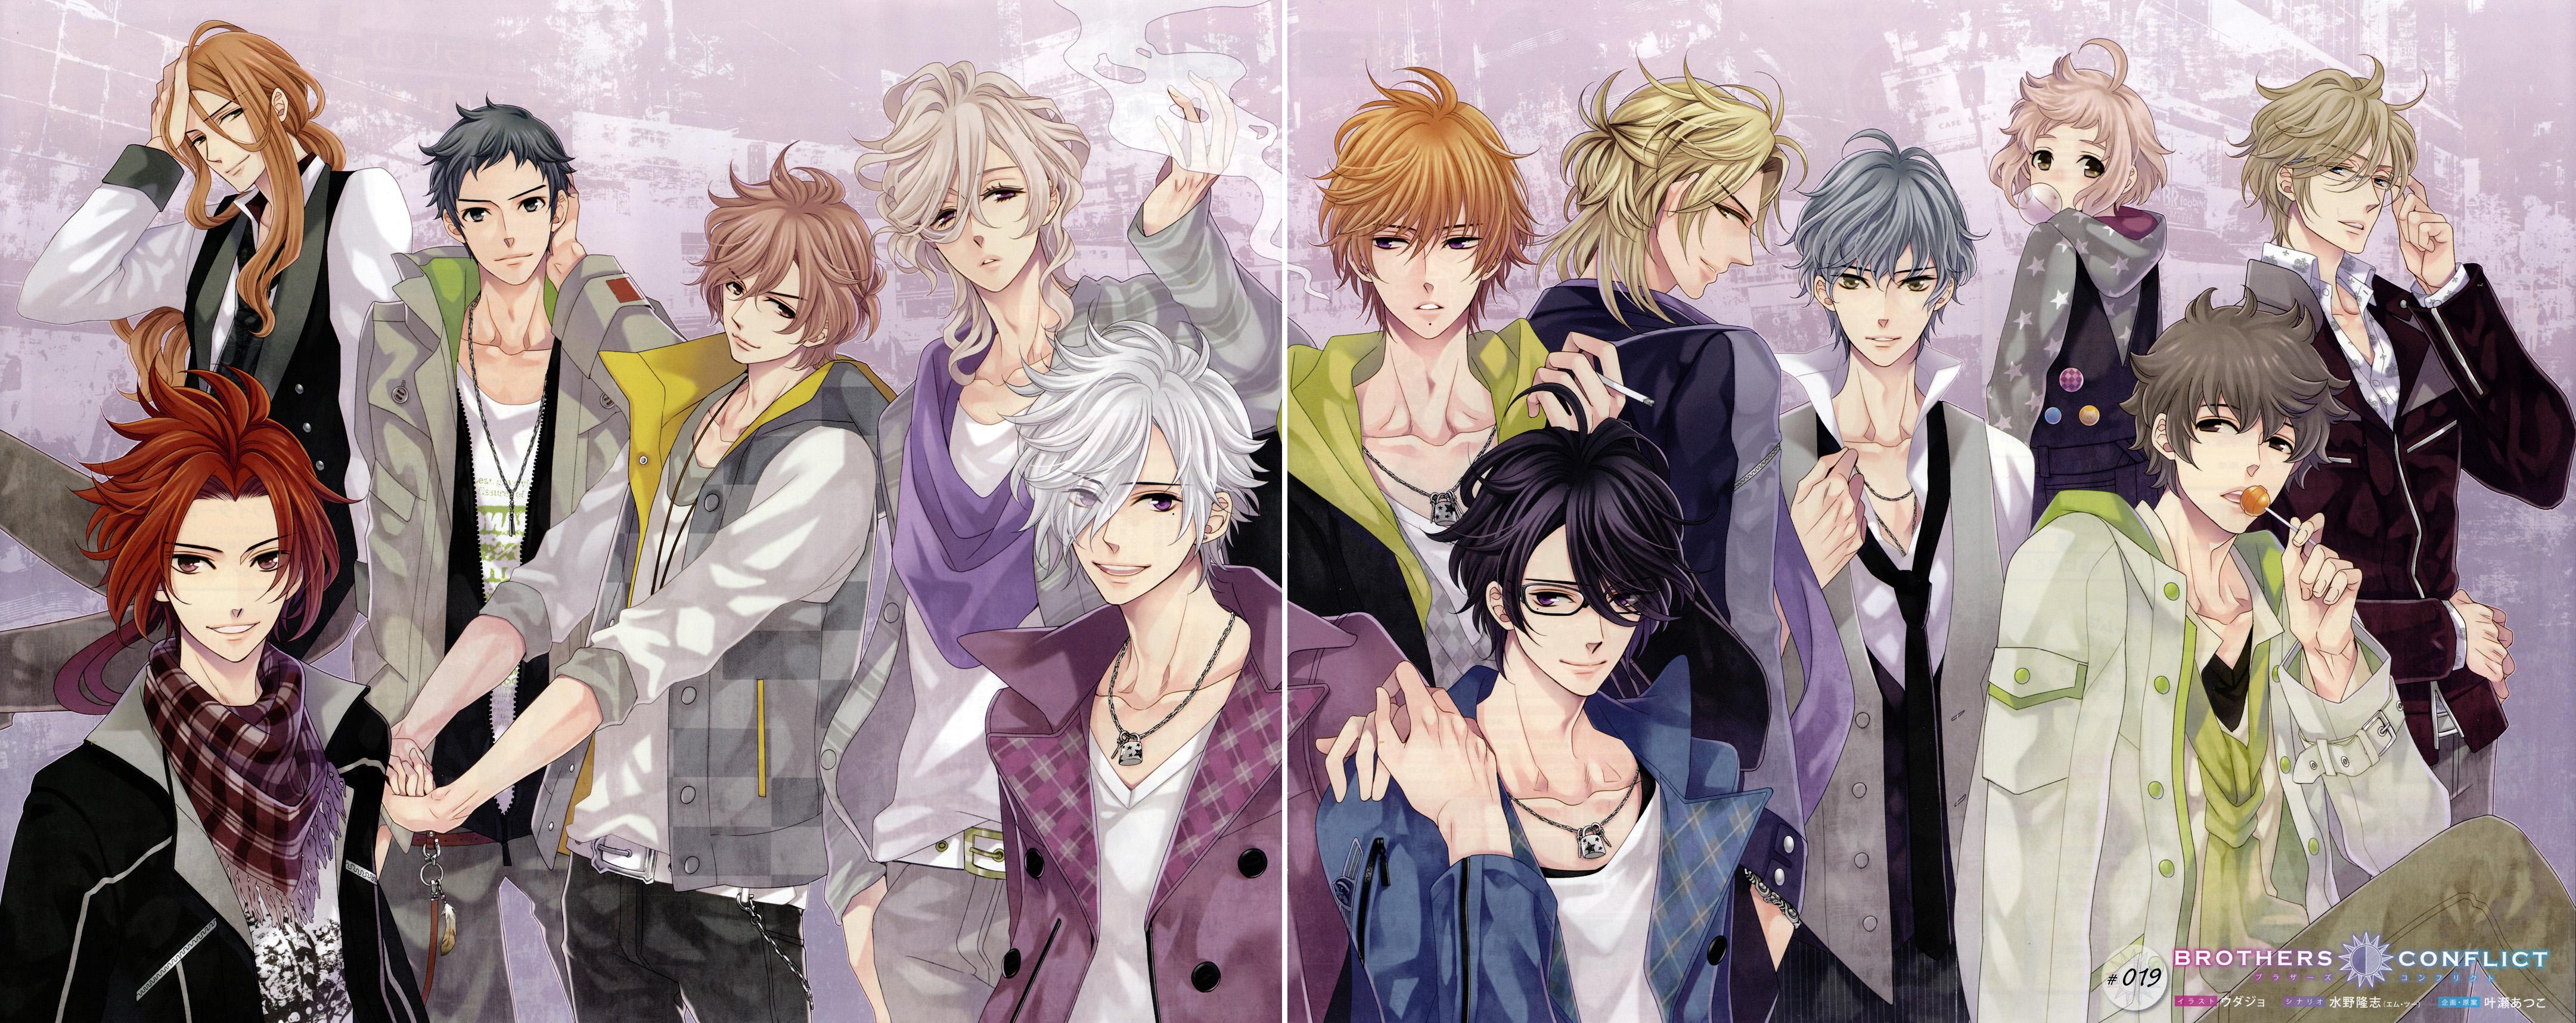 Brothers Conflict Manga Segunda Temporada - Brothers Conflict Anime (seen 1st season)/Manga/games  Anime/Manga Keep  Brothers conflict Manga Art Style